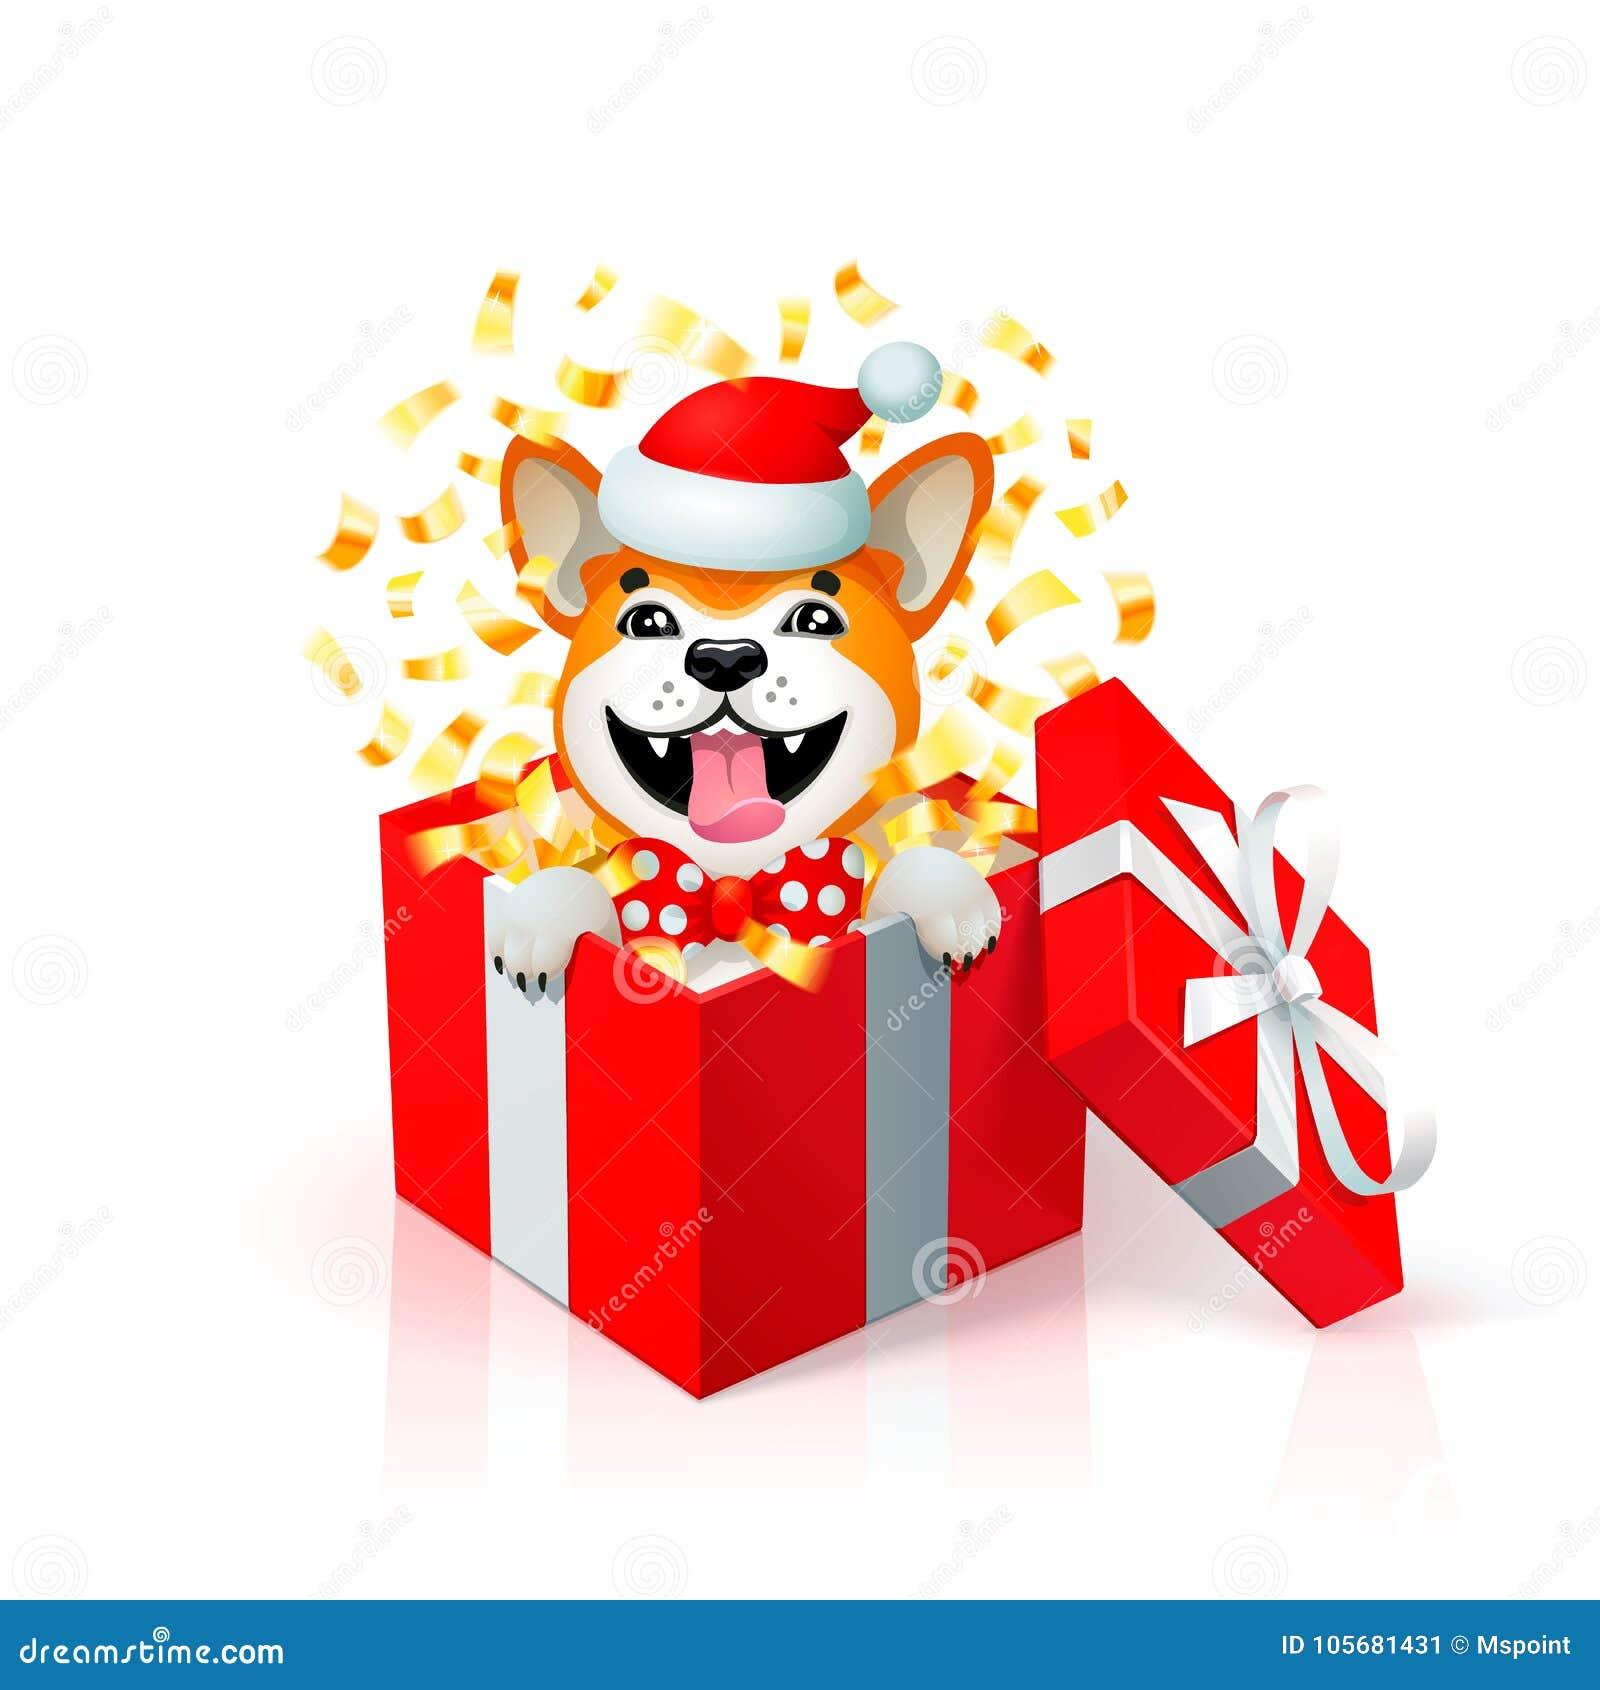 happy cartoon puppy in gift box wearing santas hat portrait of akita inu japanese dog